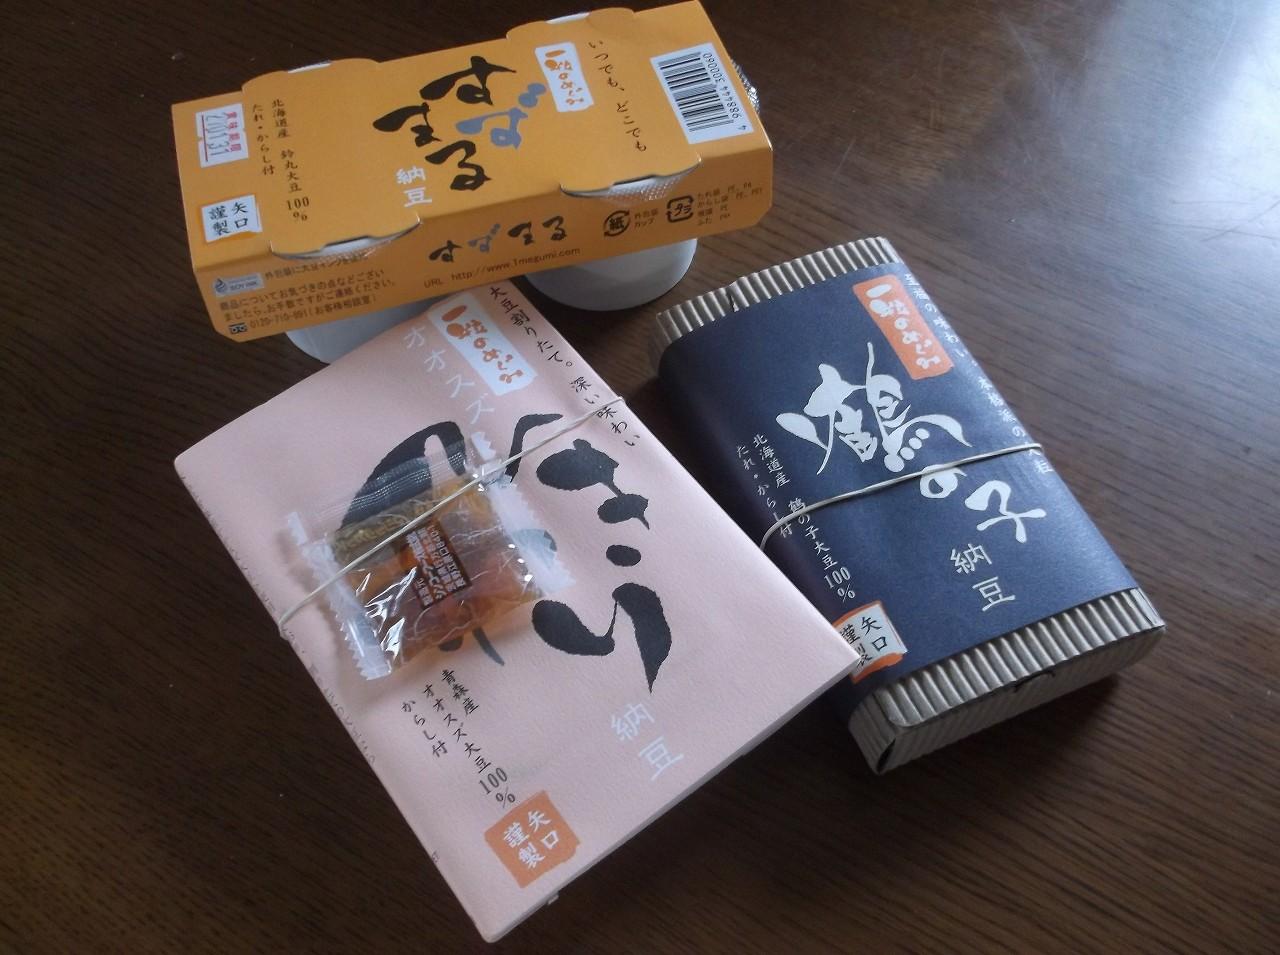 全国納豆鑑評会優秀賞受賞、納豆界のスター 埼玉ブルース第三十二回